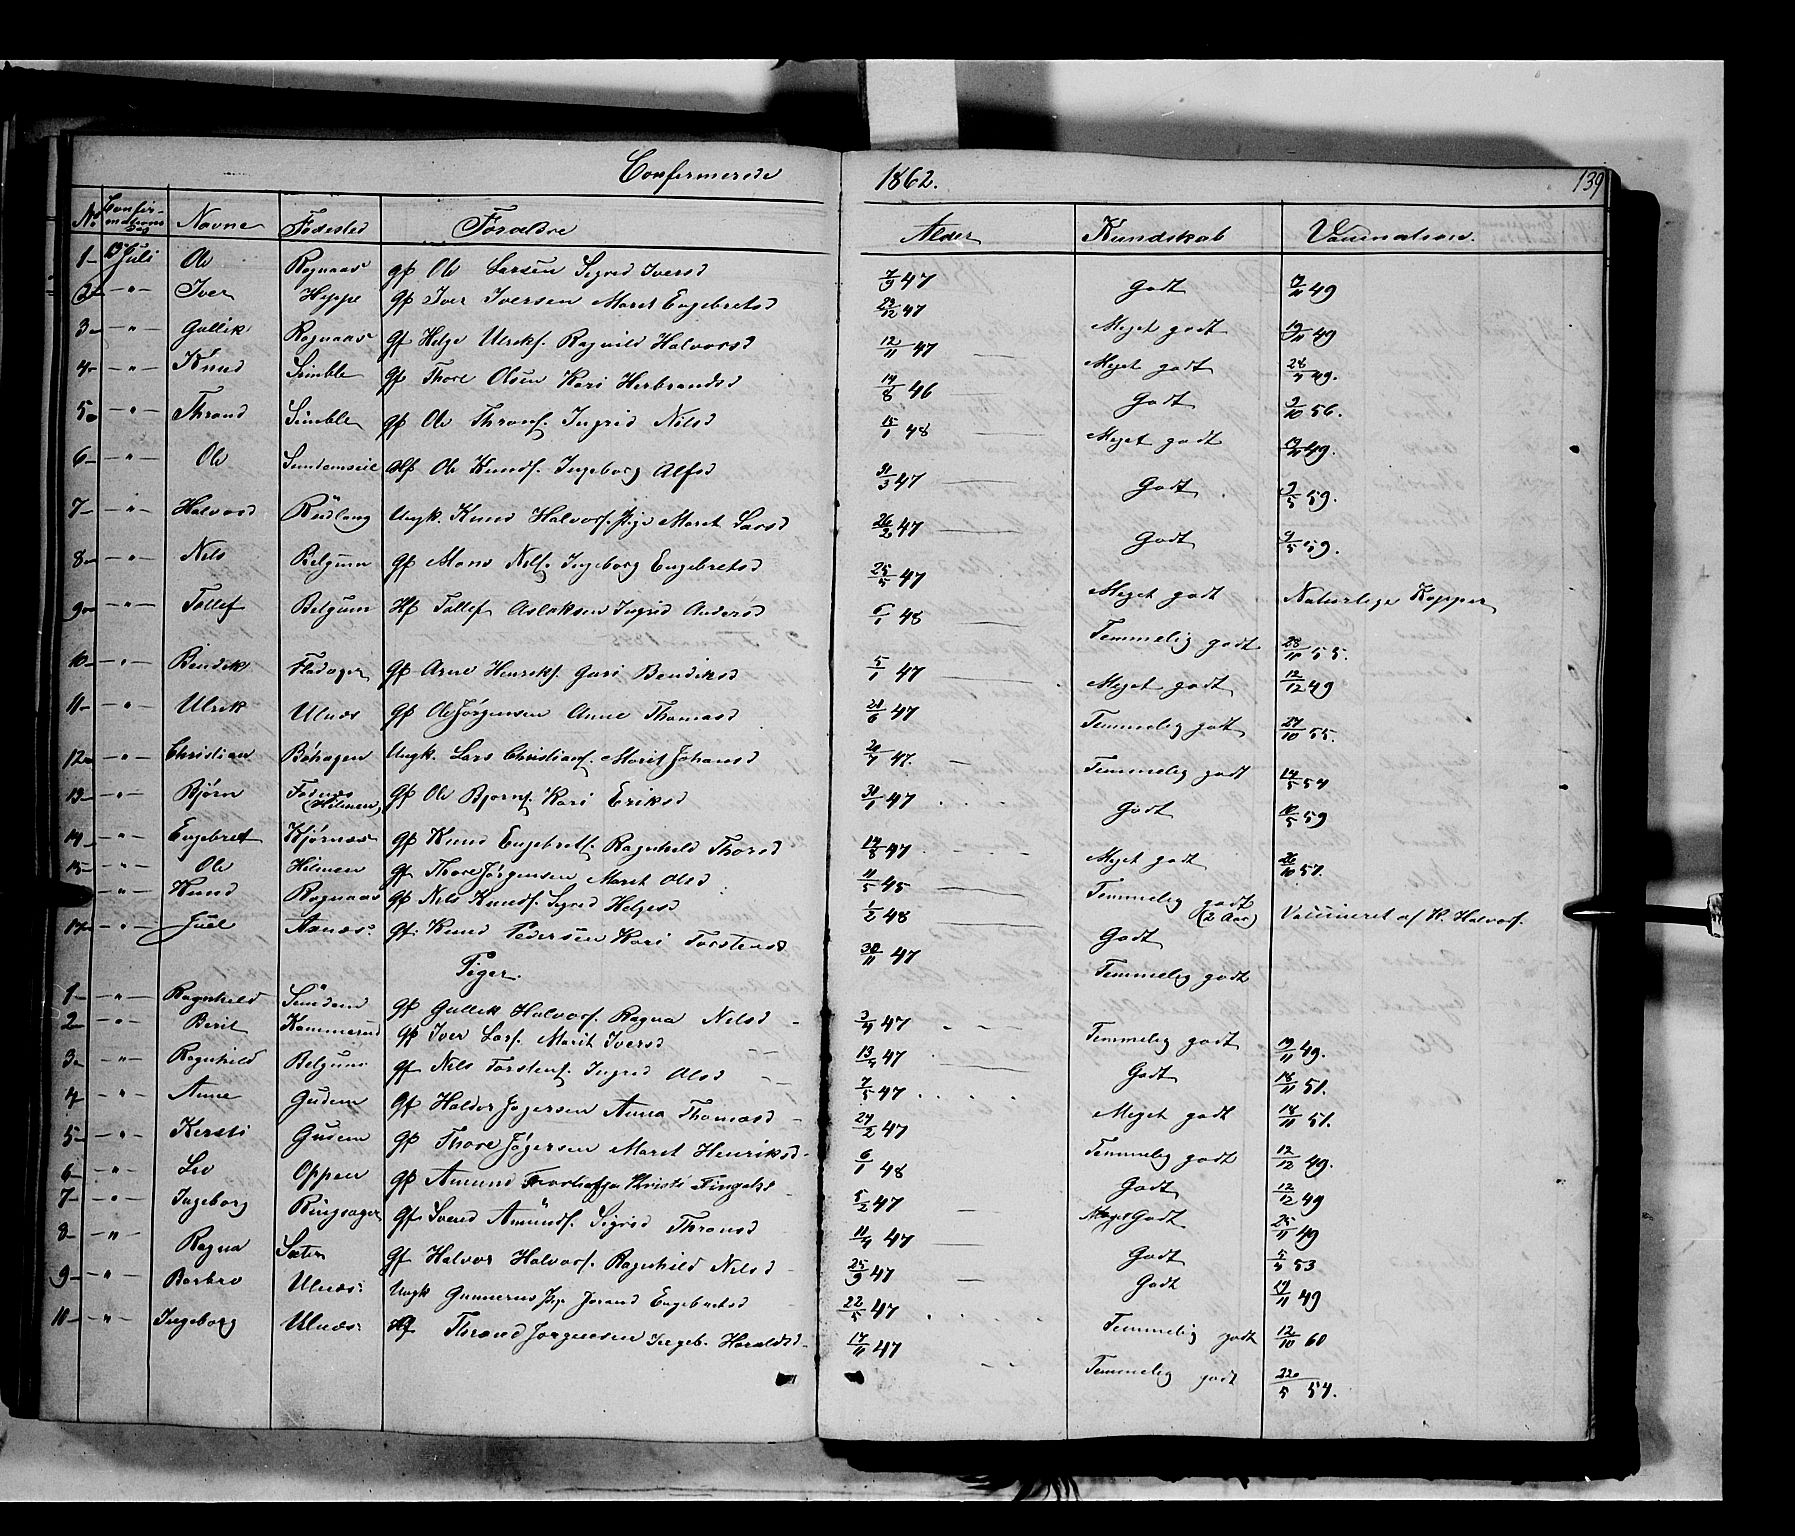 SAH, Nord-Aurdal prestekontor, Ministerialbok nr. 6, 1842-1863, s. 139